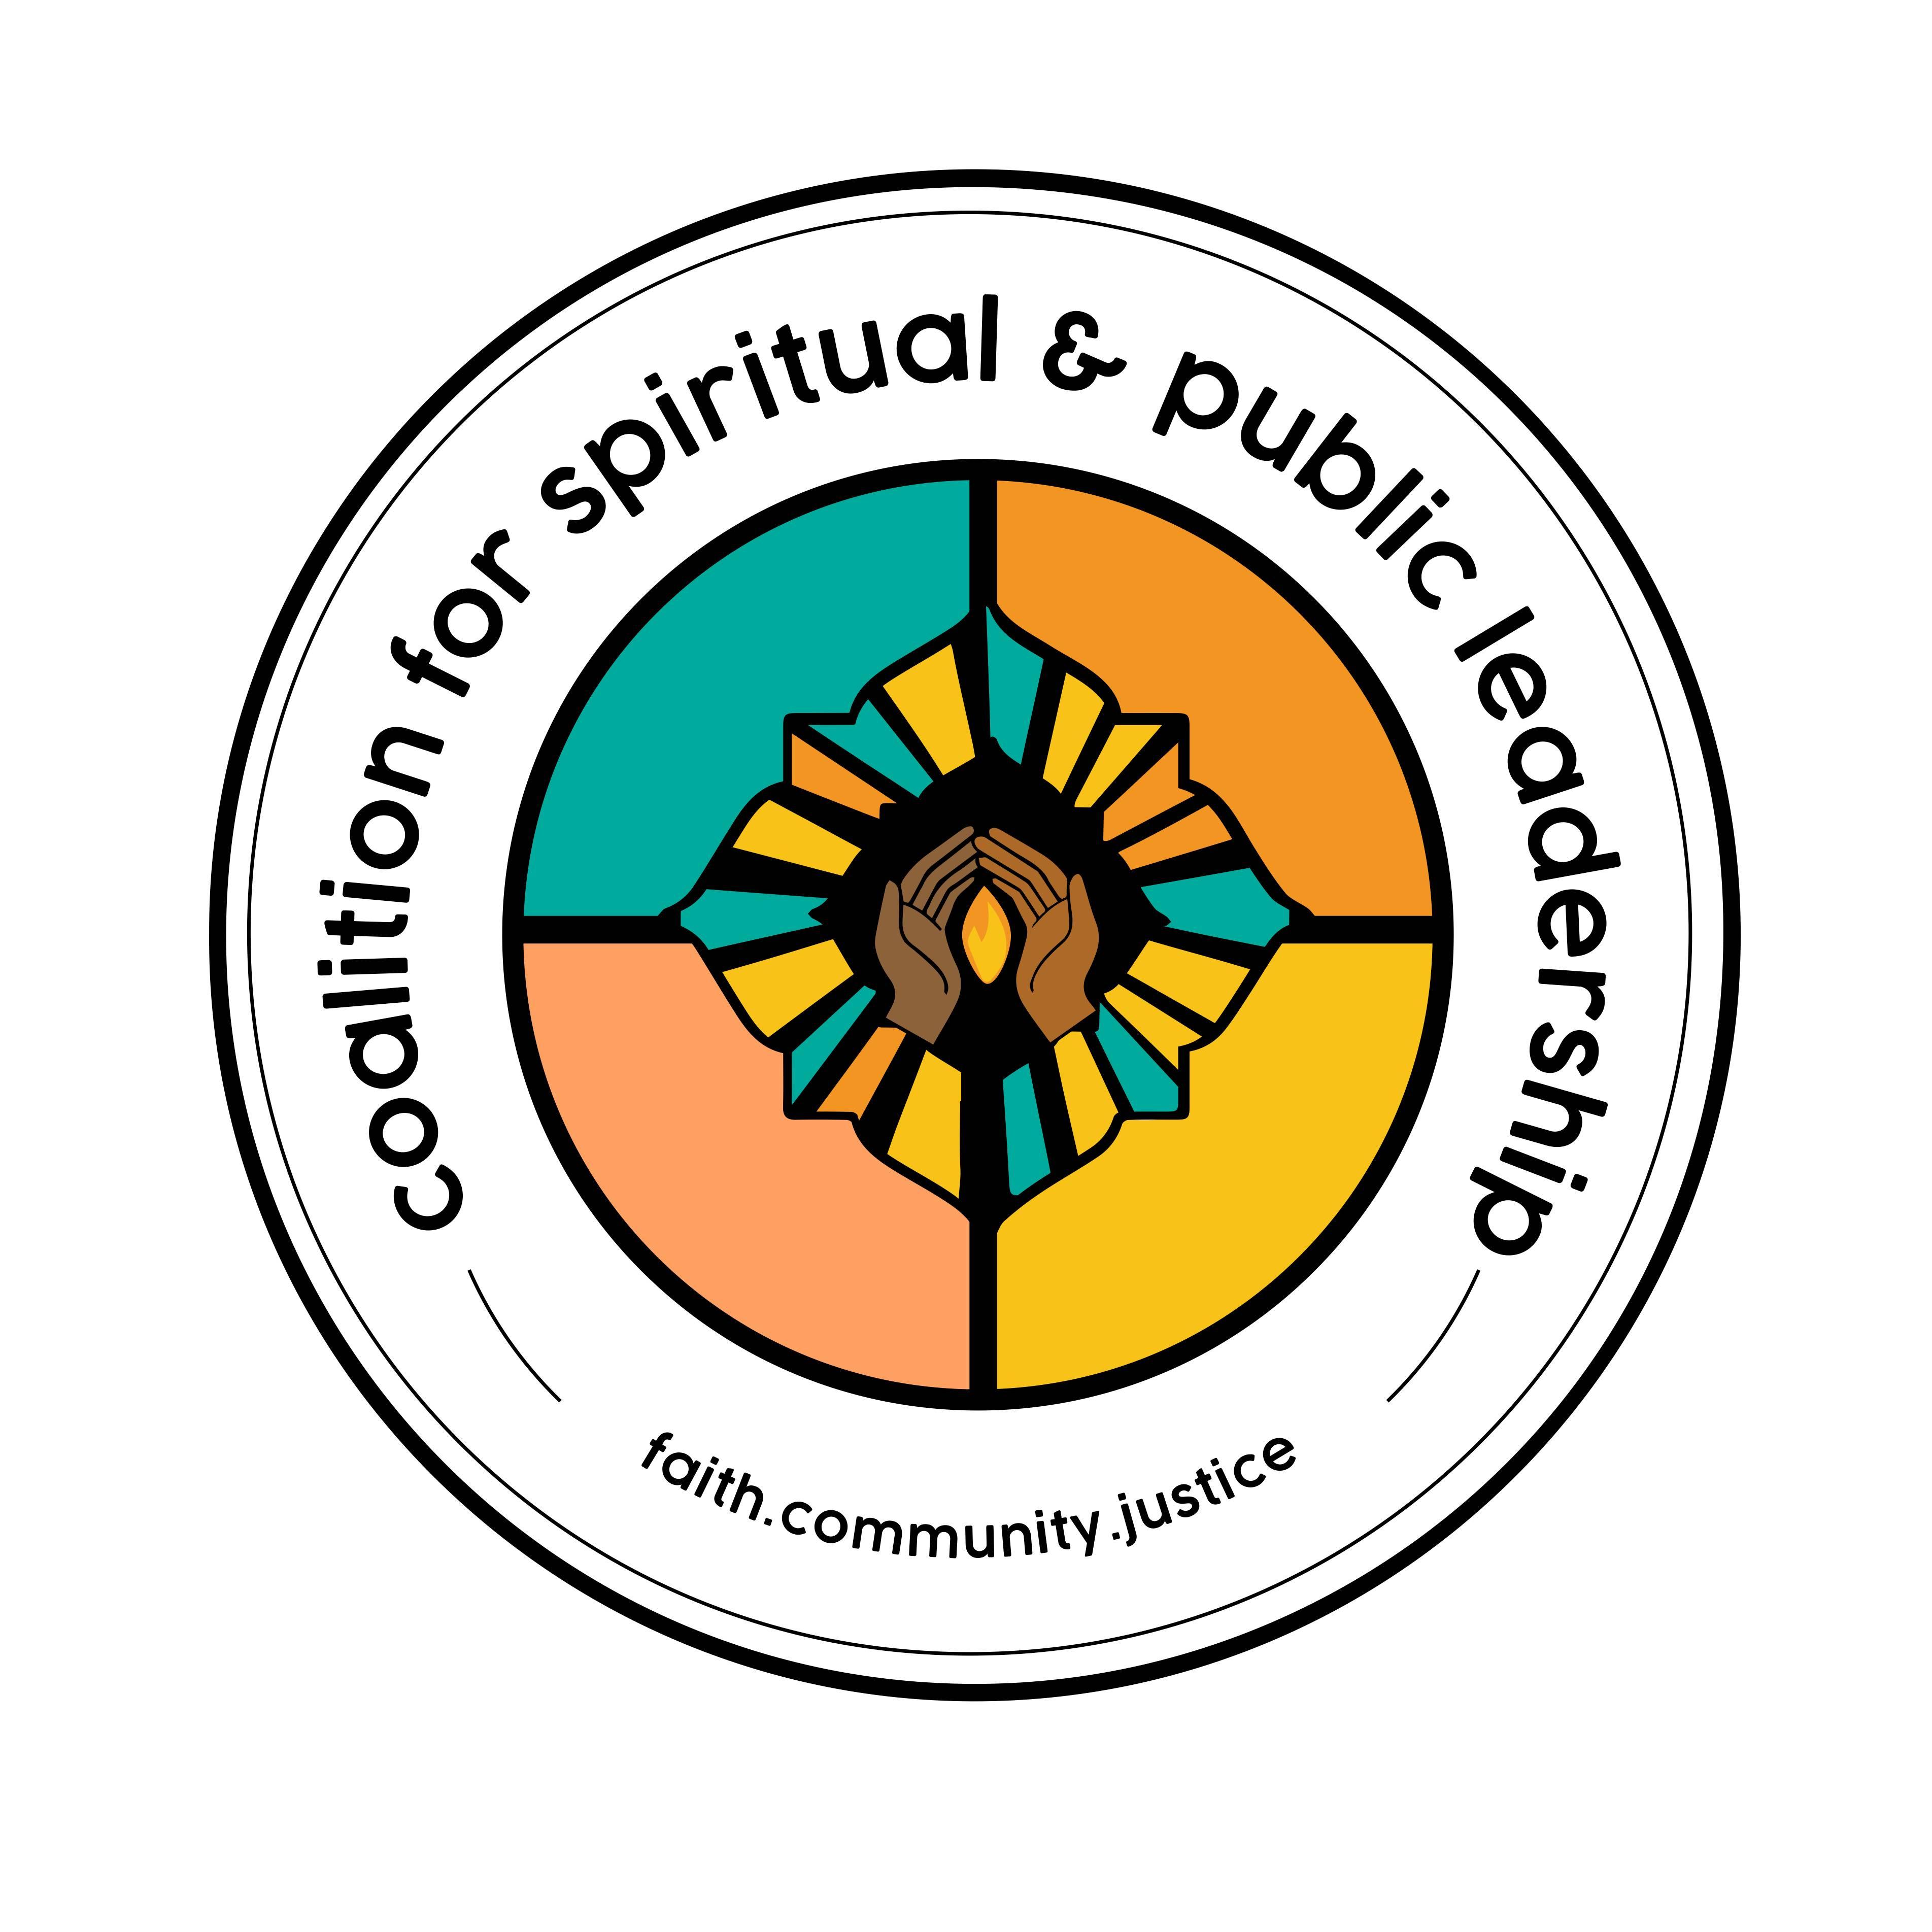 Logo of Coalition for Spiritual and Public Leadership